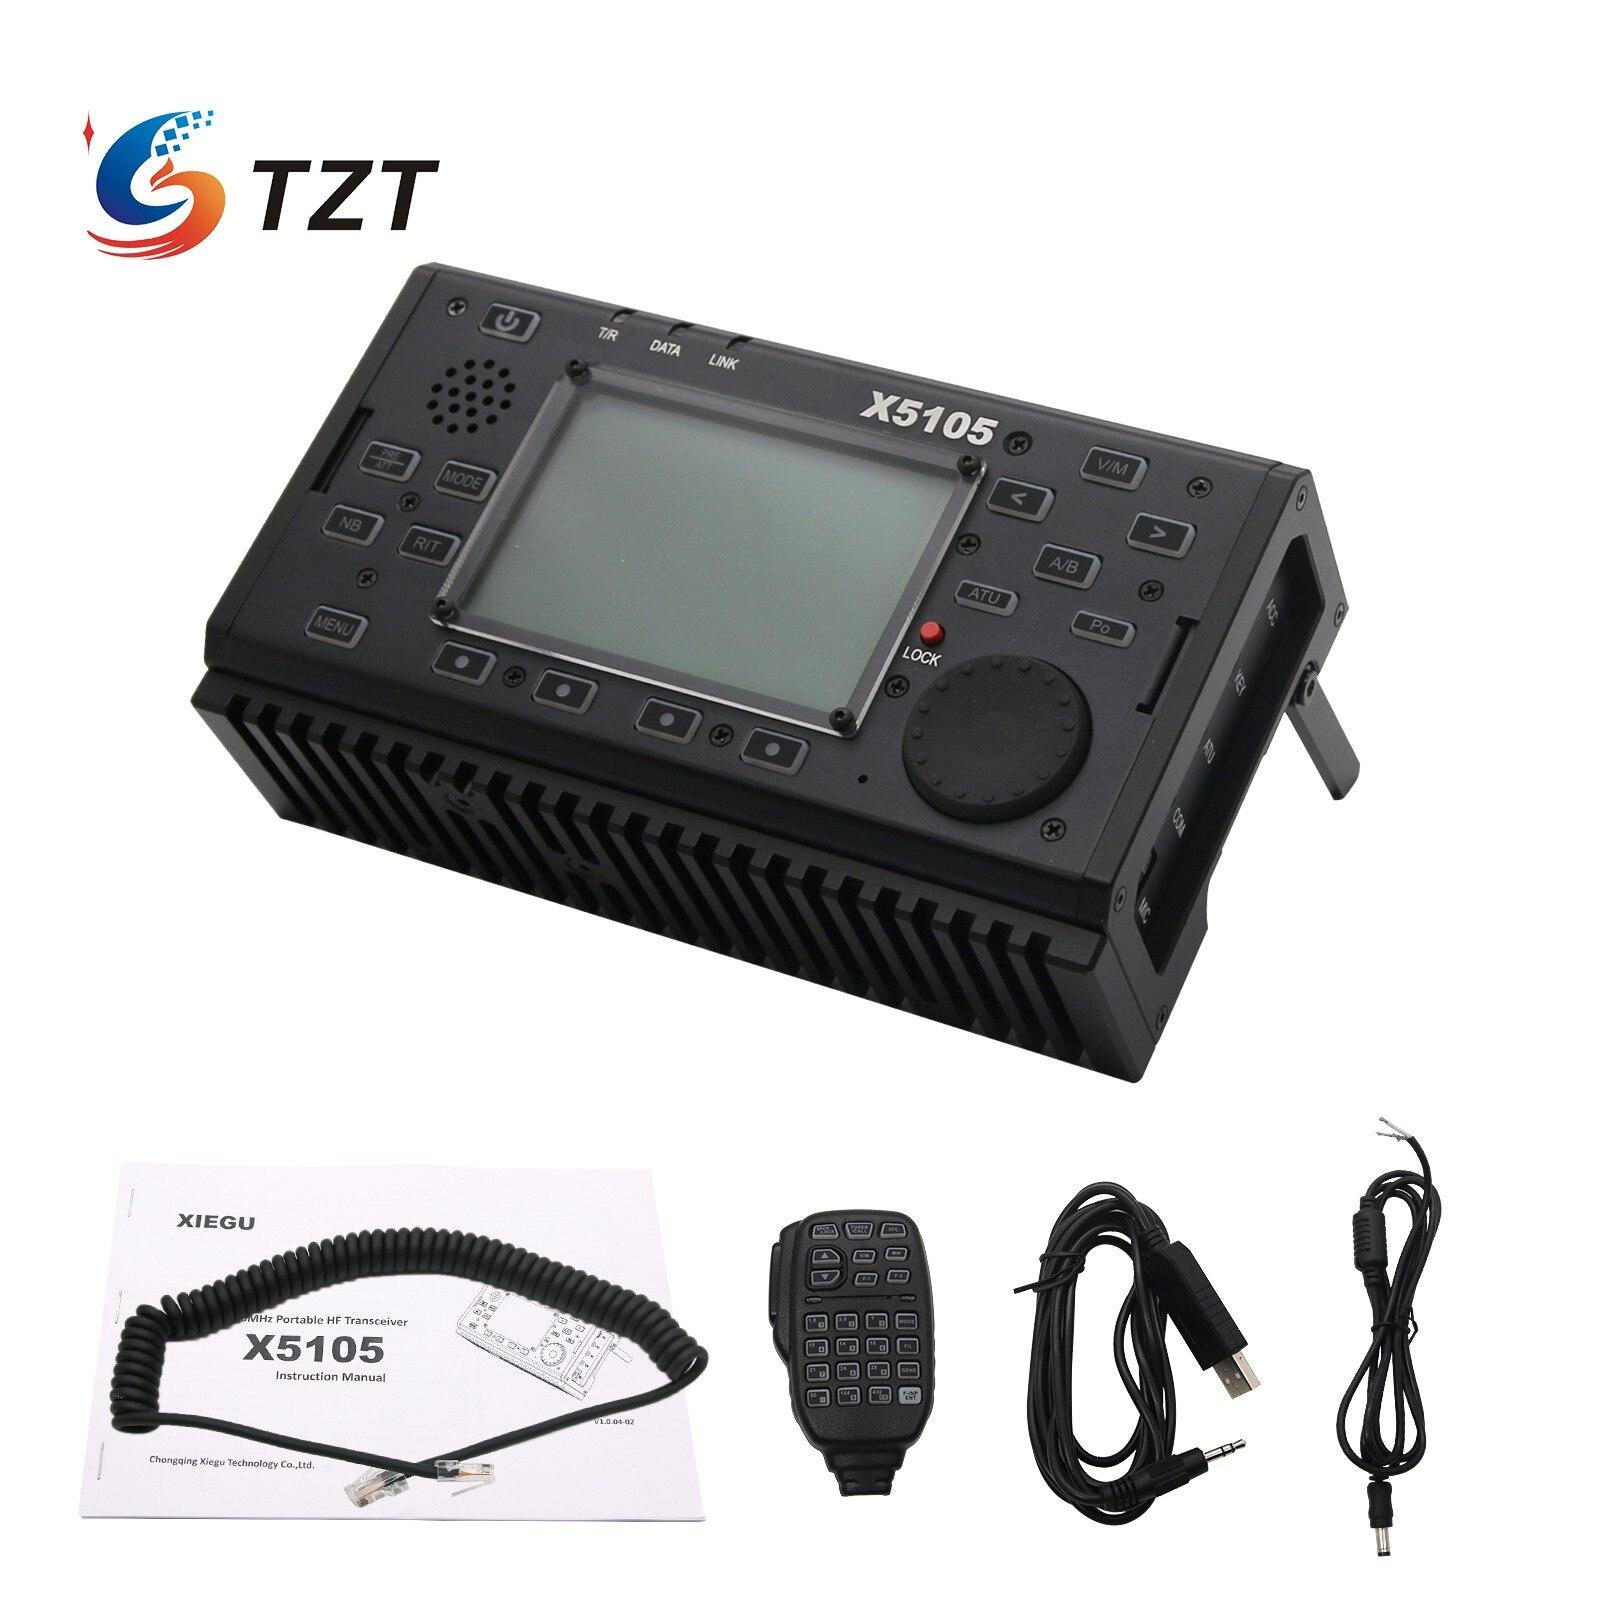 TZT TZT الموجات القصيرة جهاز الإرسال والاستقبال اللاسلكي HF مع IF إخراج جميع العصابات التي تغطي SSB CW AM FM rity PSK XIEGU X5105